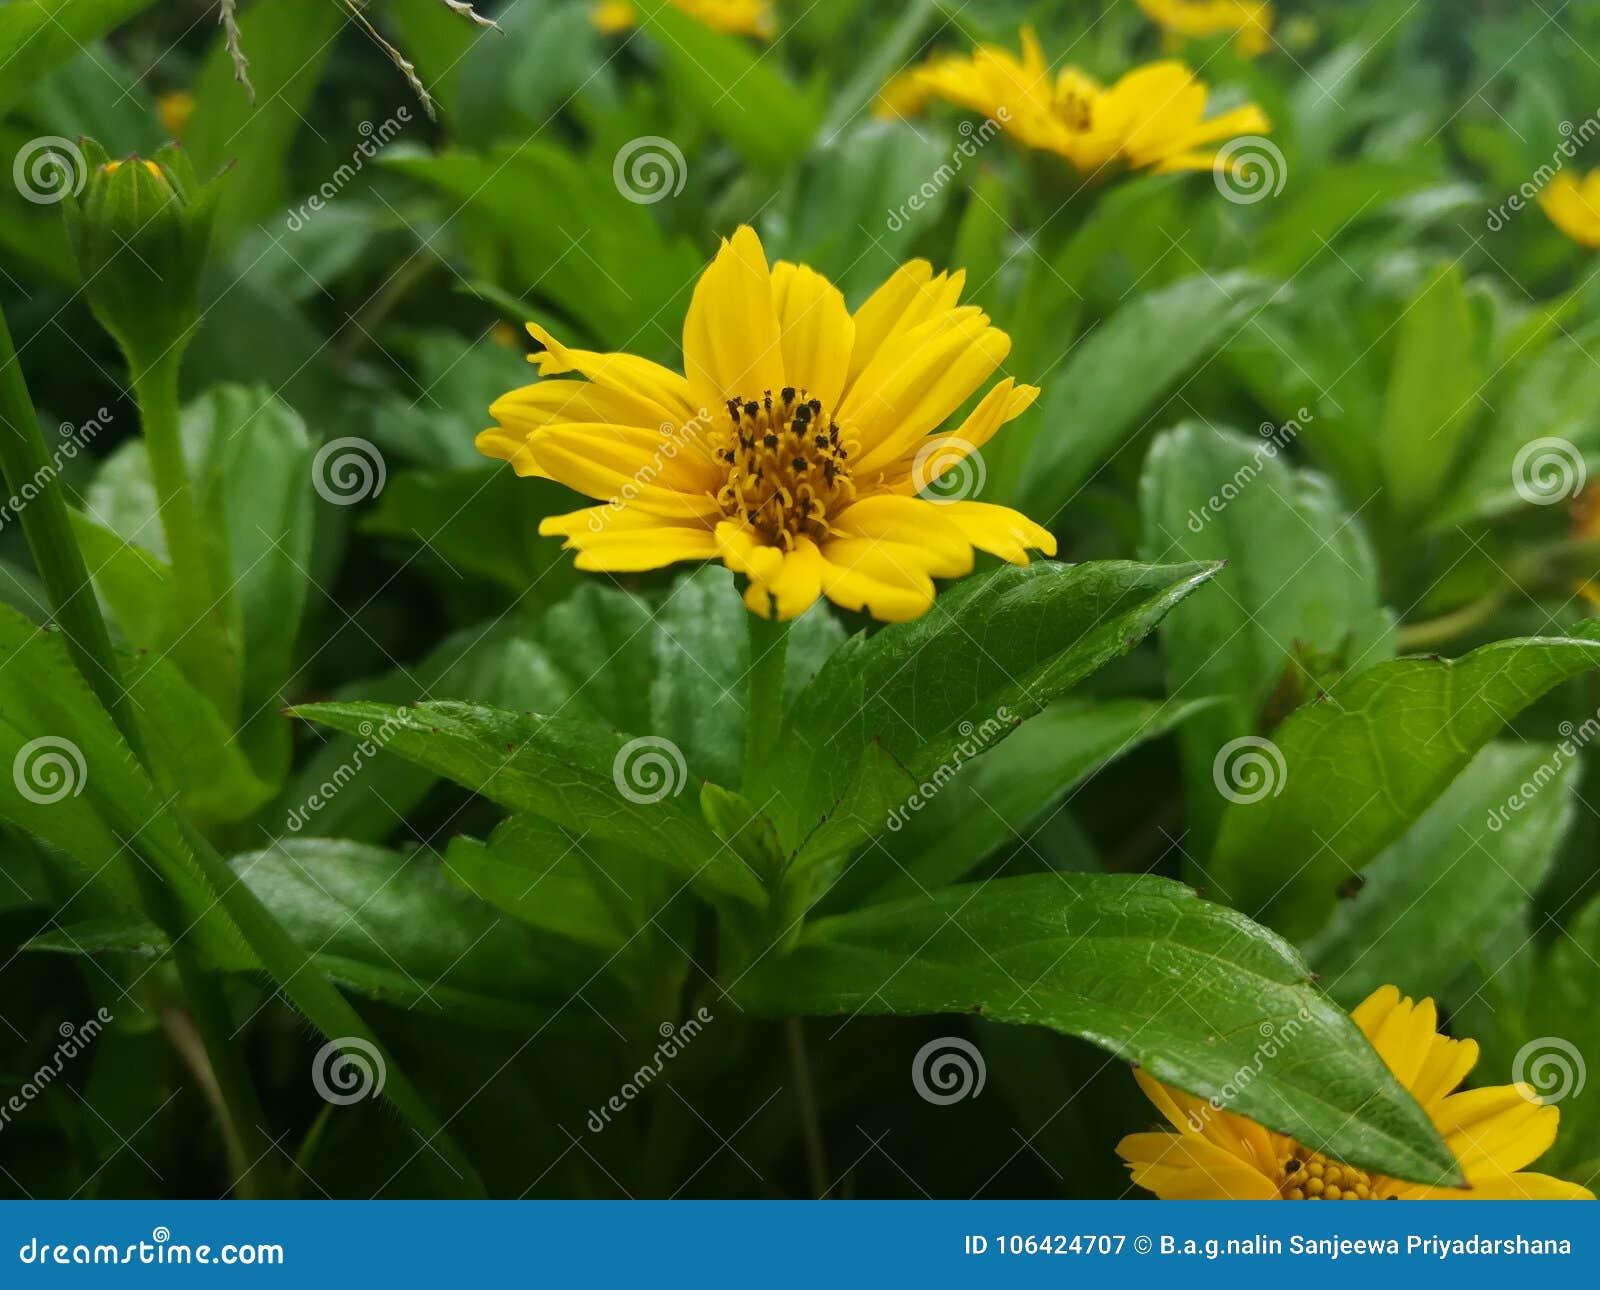 Beautiful yellow flower in srilanka stock image image of flower beautiful yellow flower in srilanka mightylinksfo